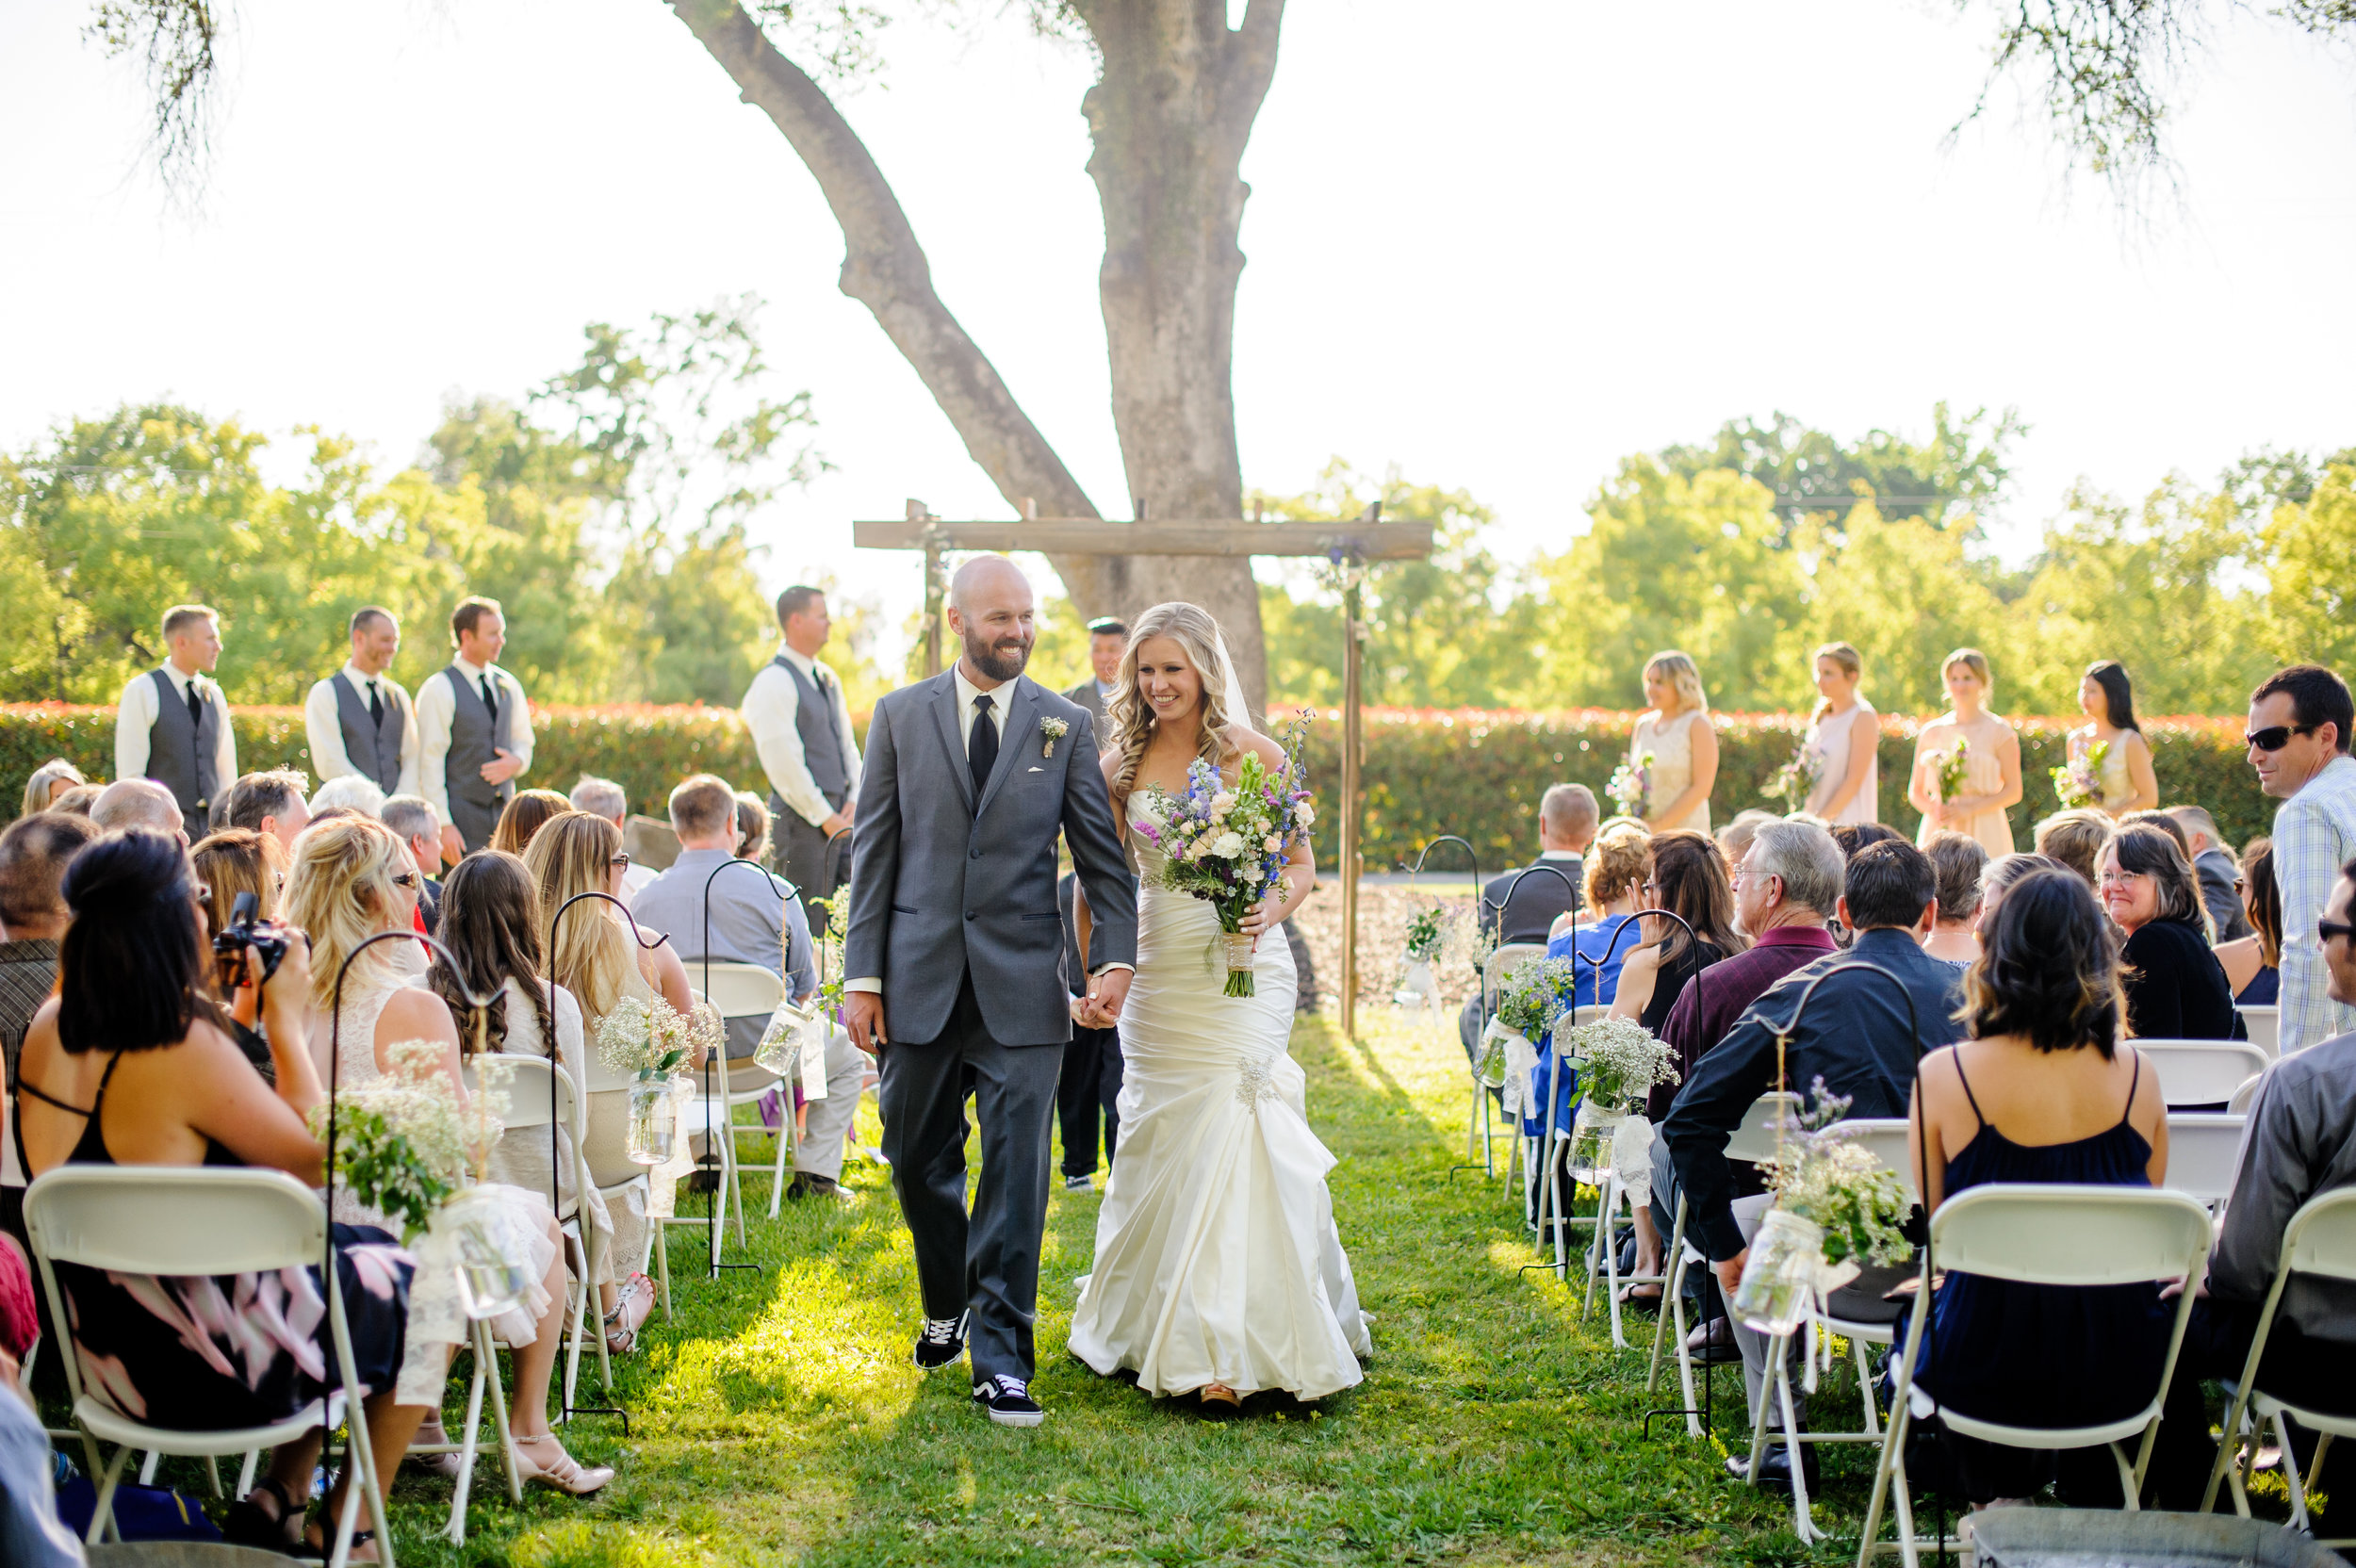 lindsey-alex-021-backyard-sacramento-wedding-photographer-katherine-nicole-photography.JPG